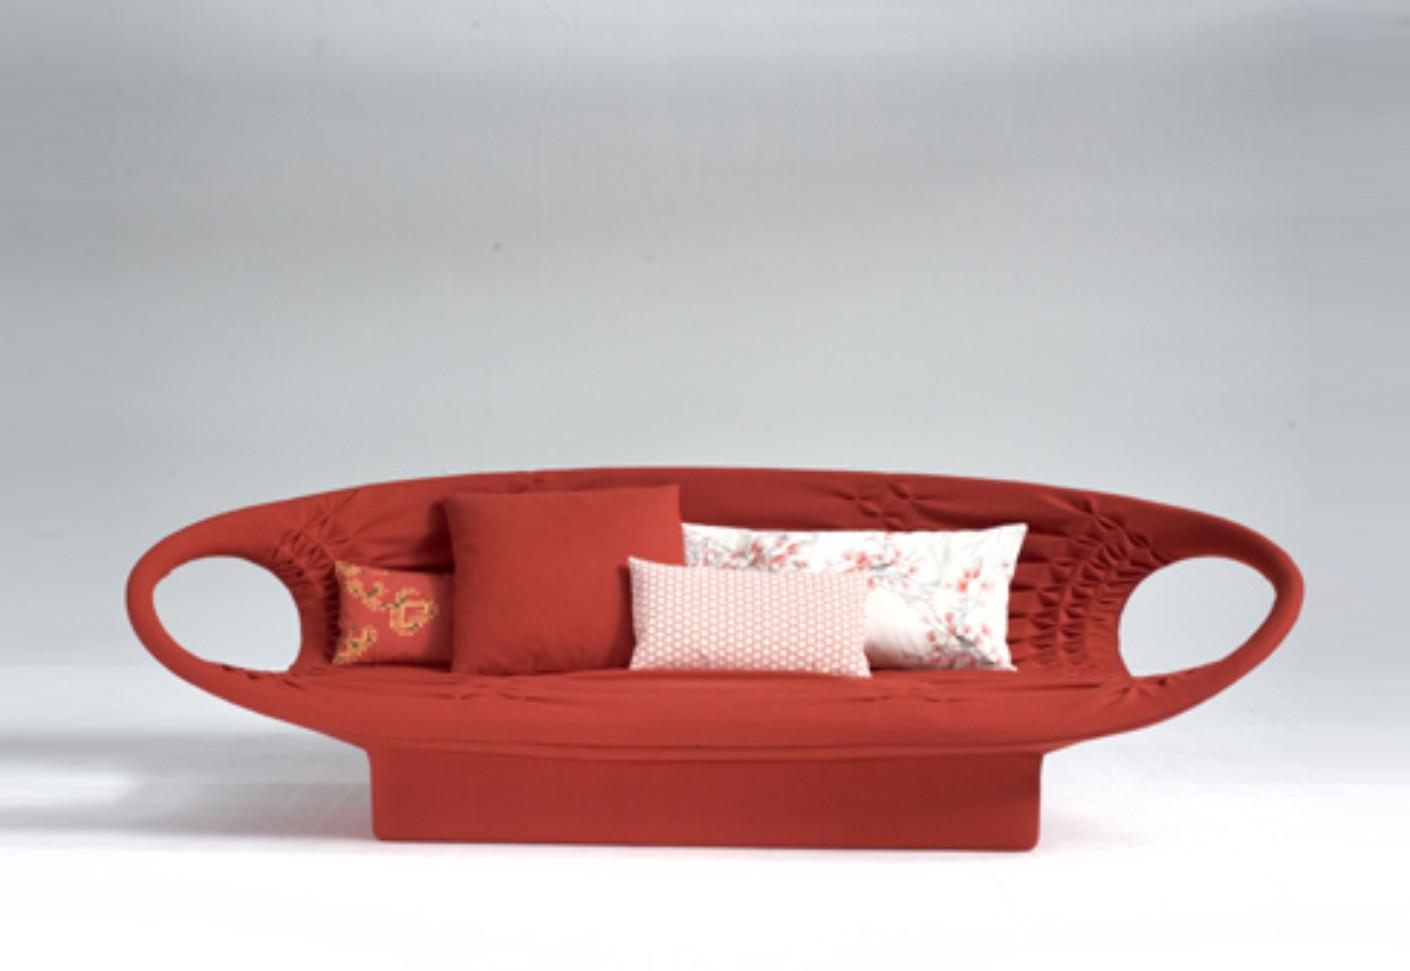 Groovy Smock Sofa By Moroso Stylepark Interior Design Ideas Skatsoteloinfo